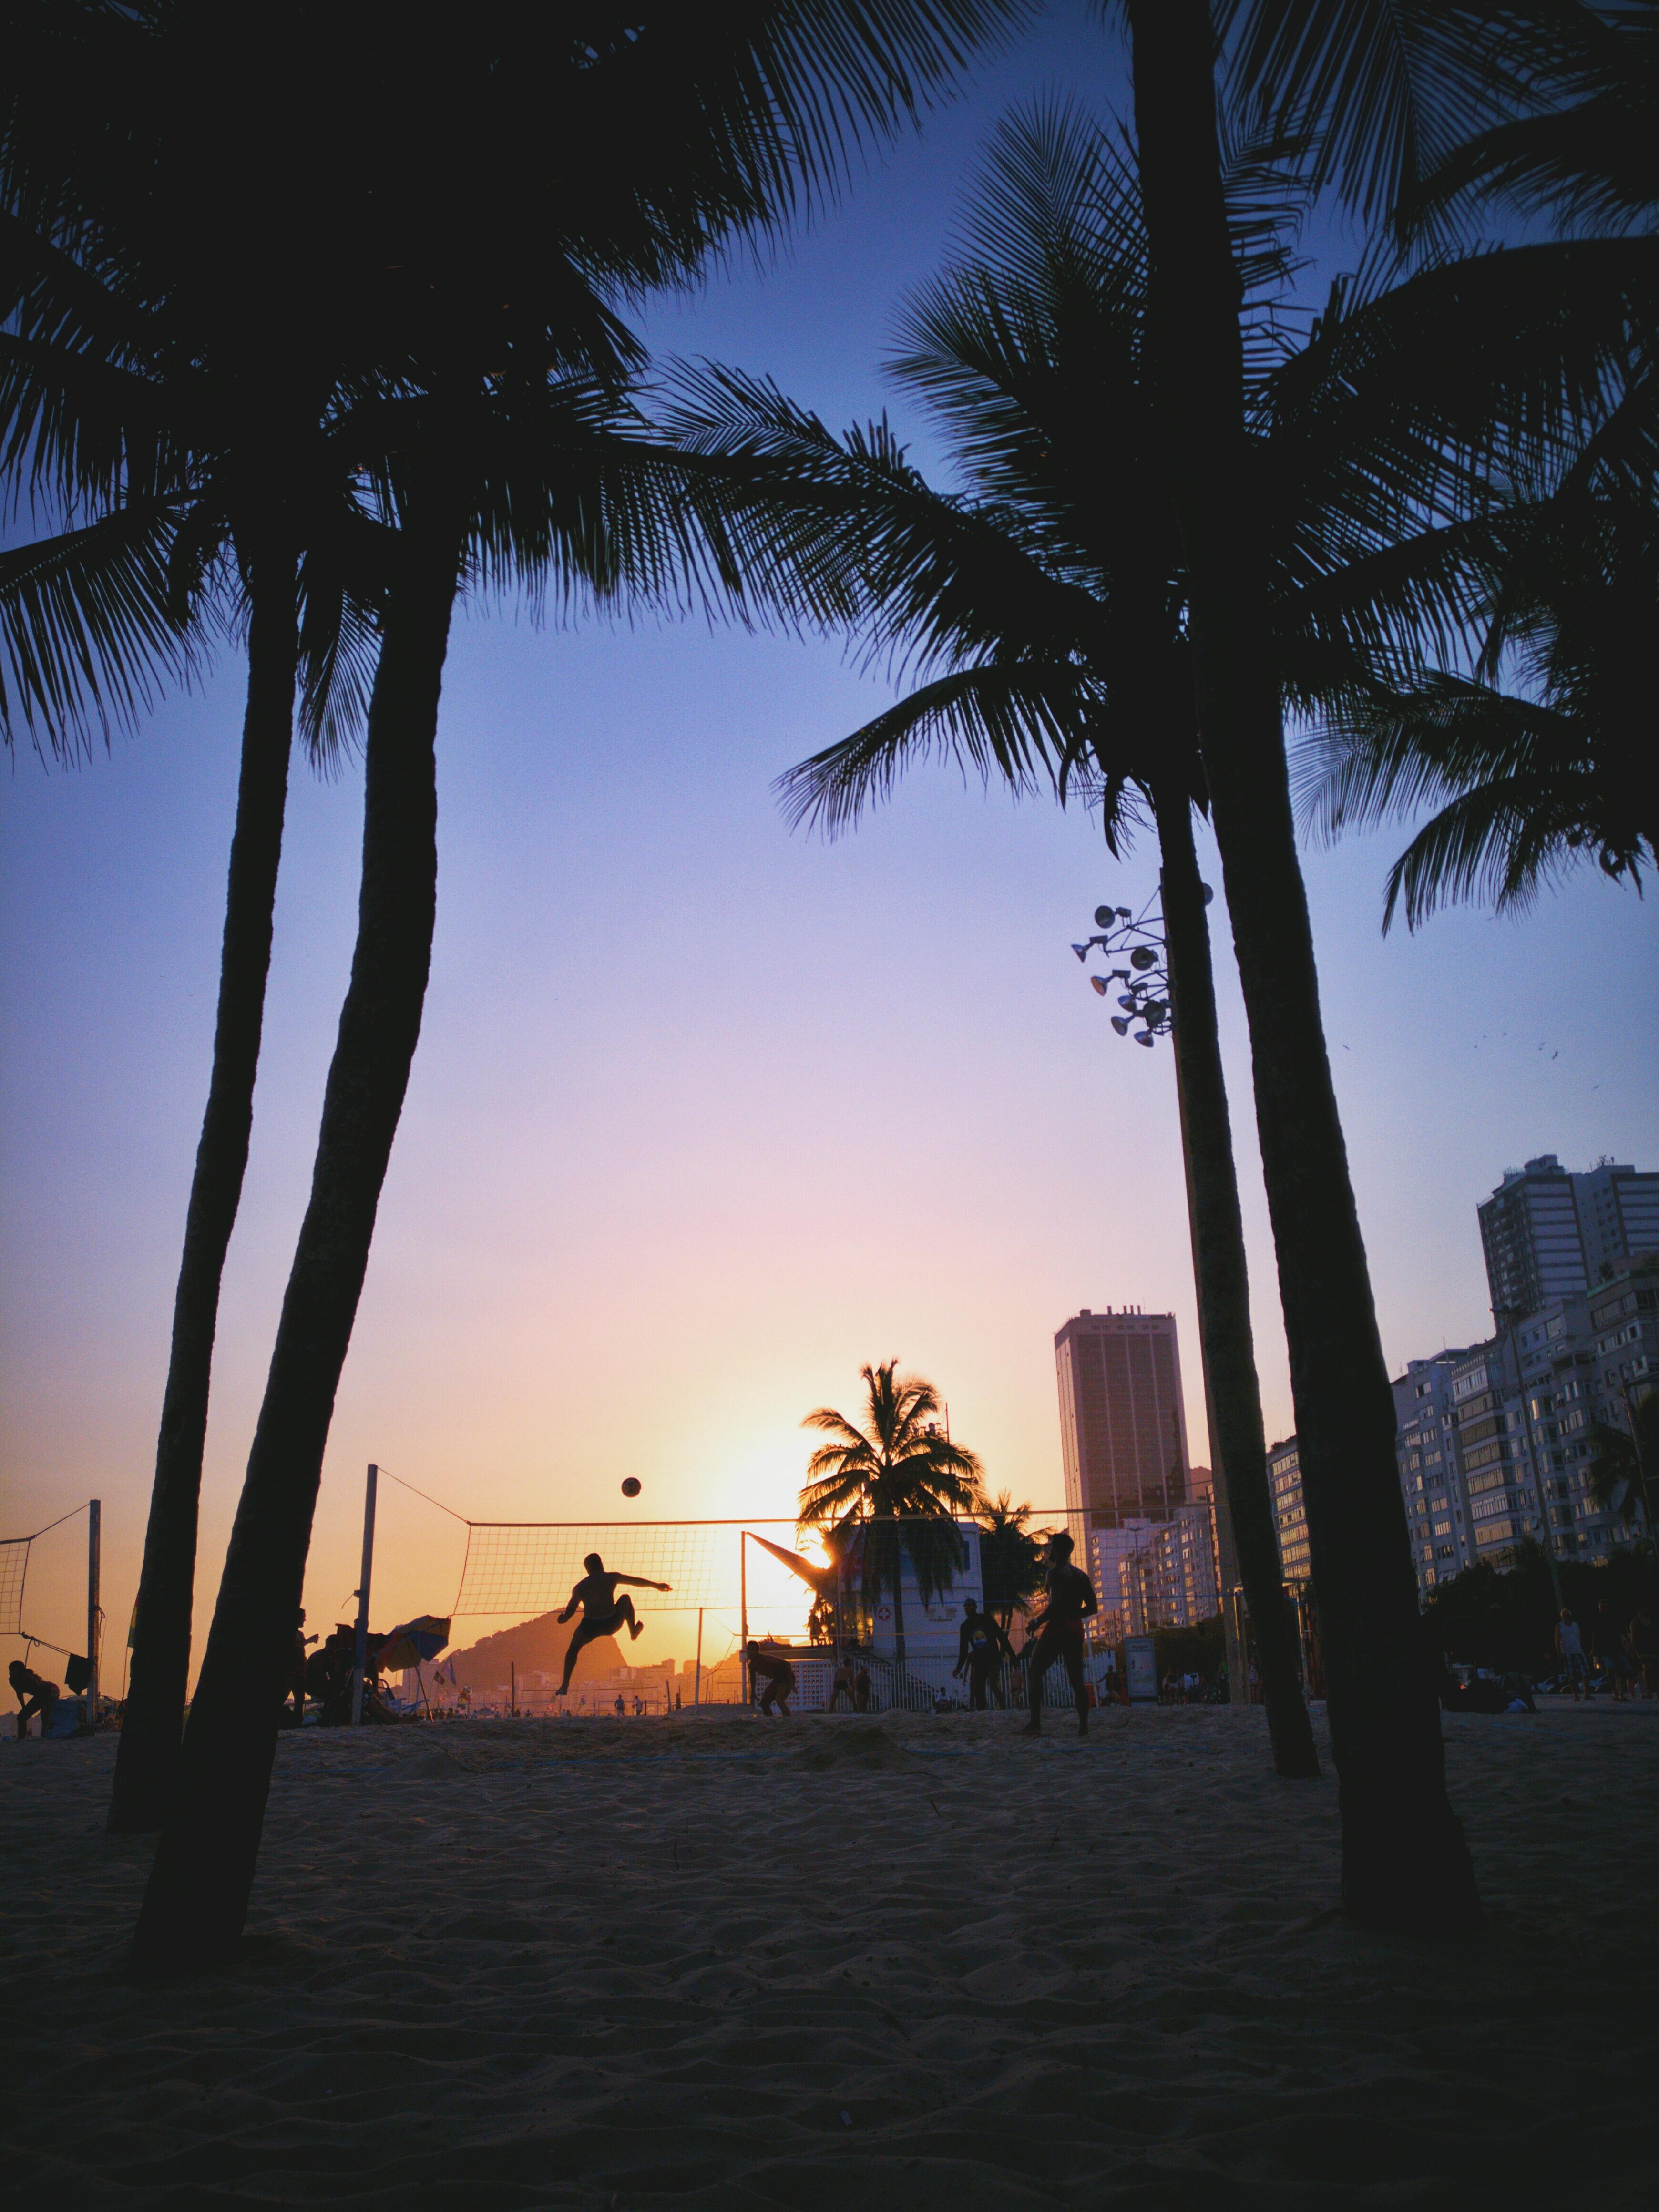 Soccer wolley -OnePlus3T - Leme  beach, Rio de Janeiro.jpg